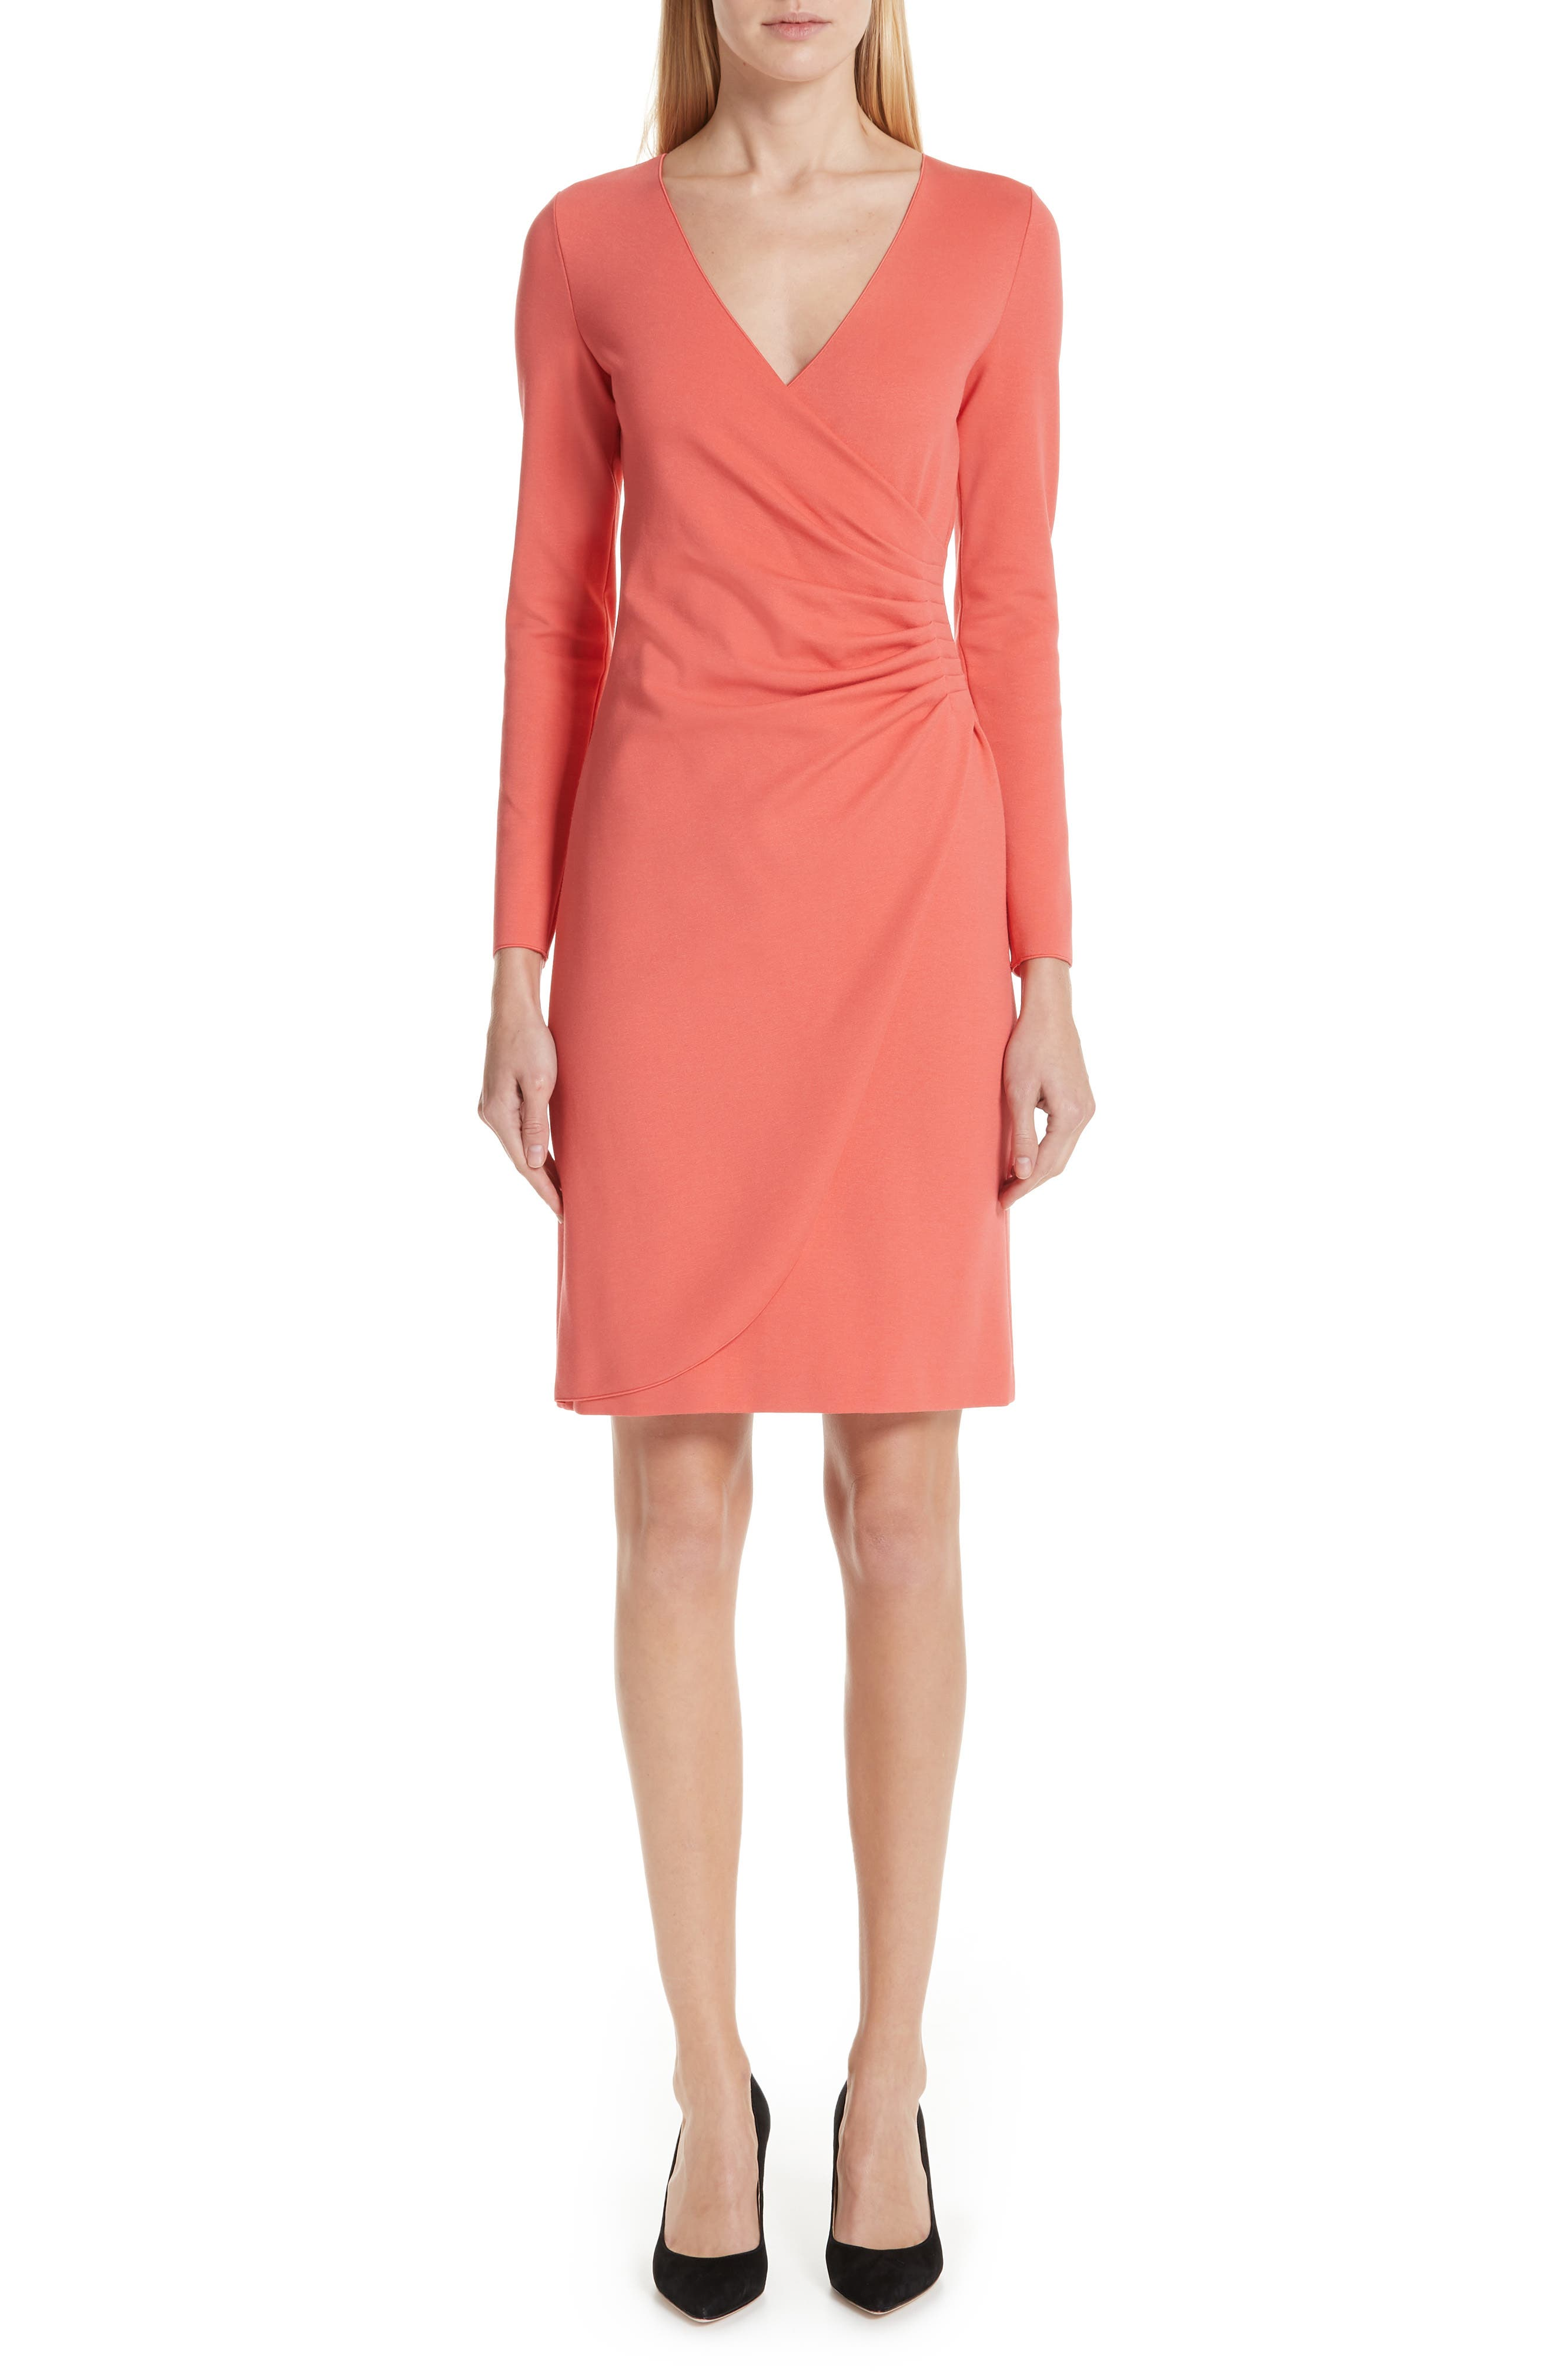 EMPORIO ARMANI,                             Punto Milano Faux Wrap Dress,                             Main thumbnail 1, color,                             SUNRISE RED